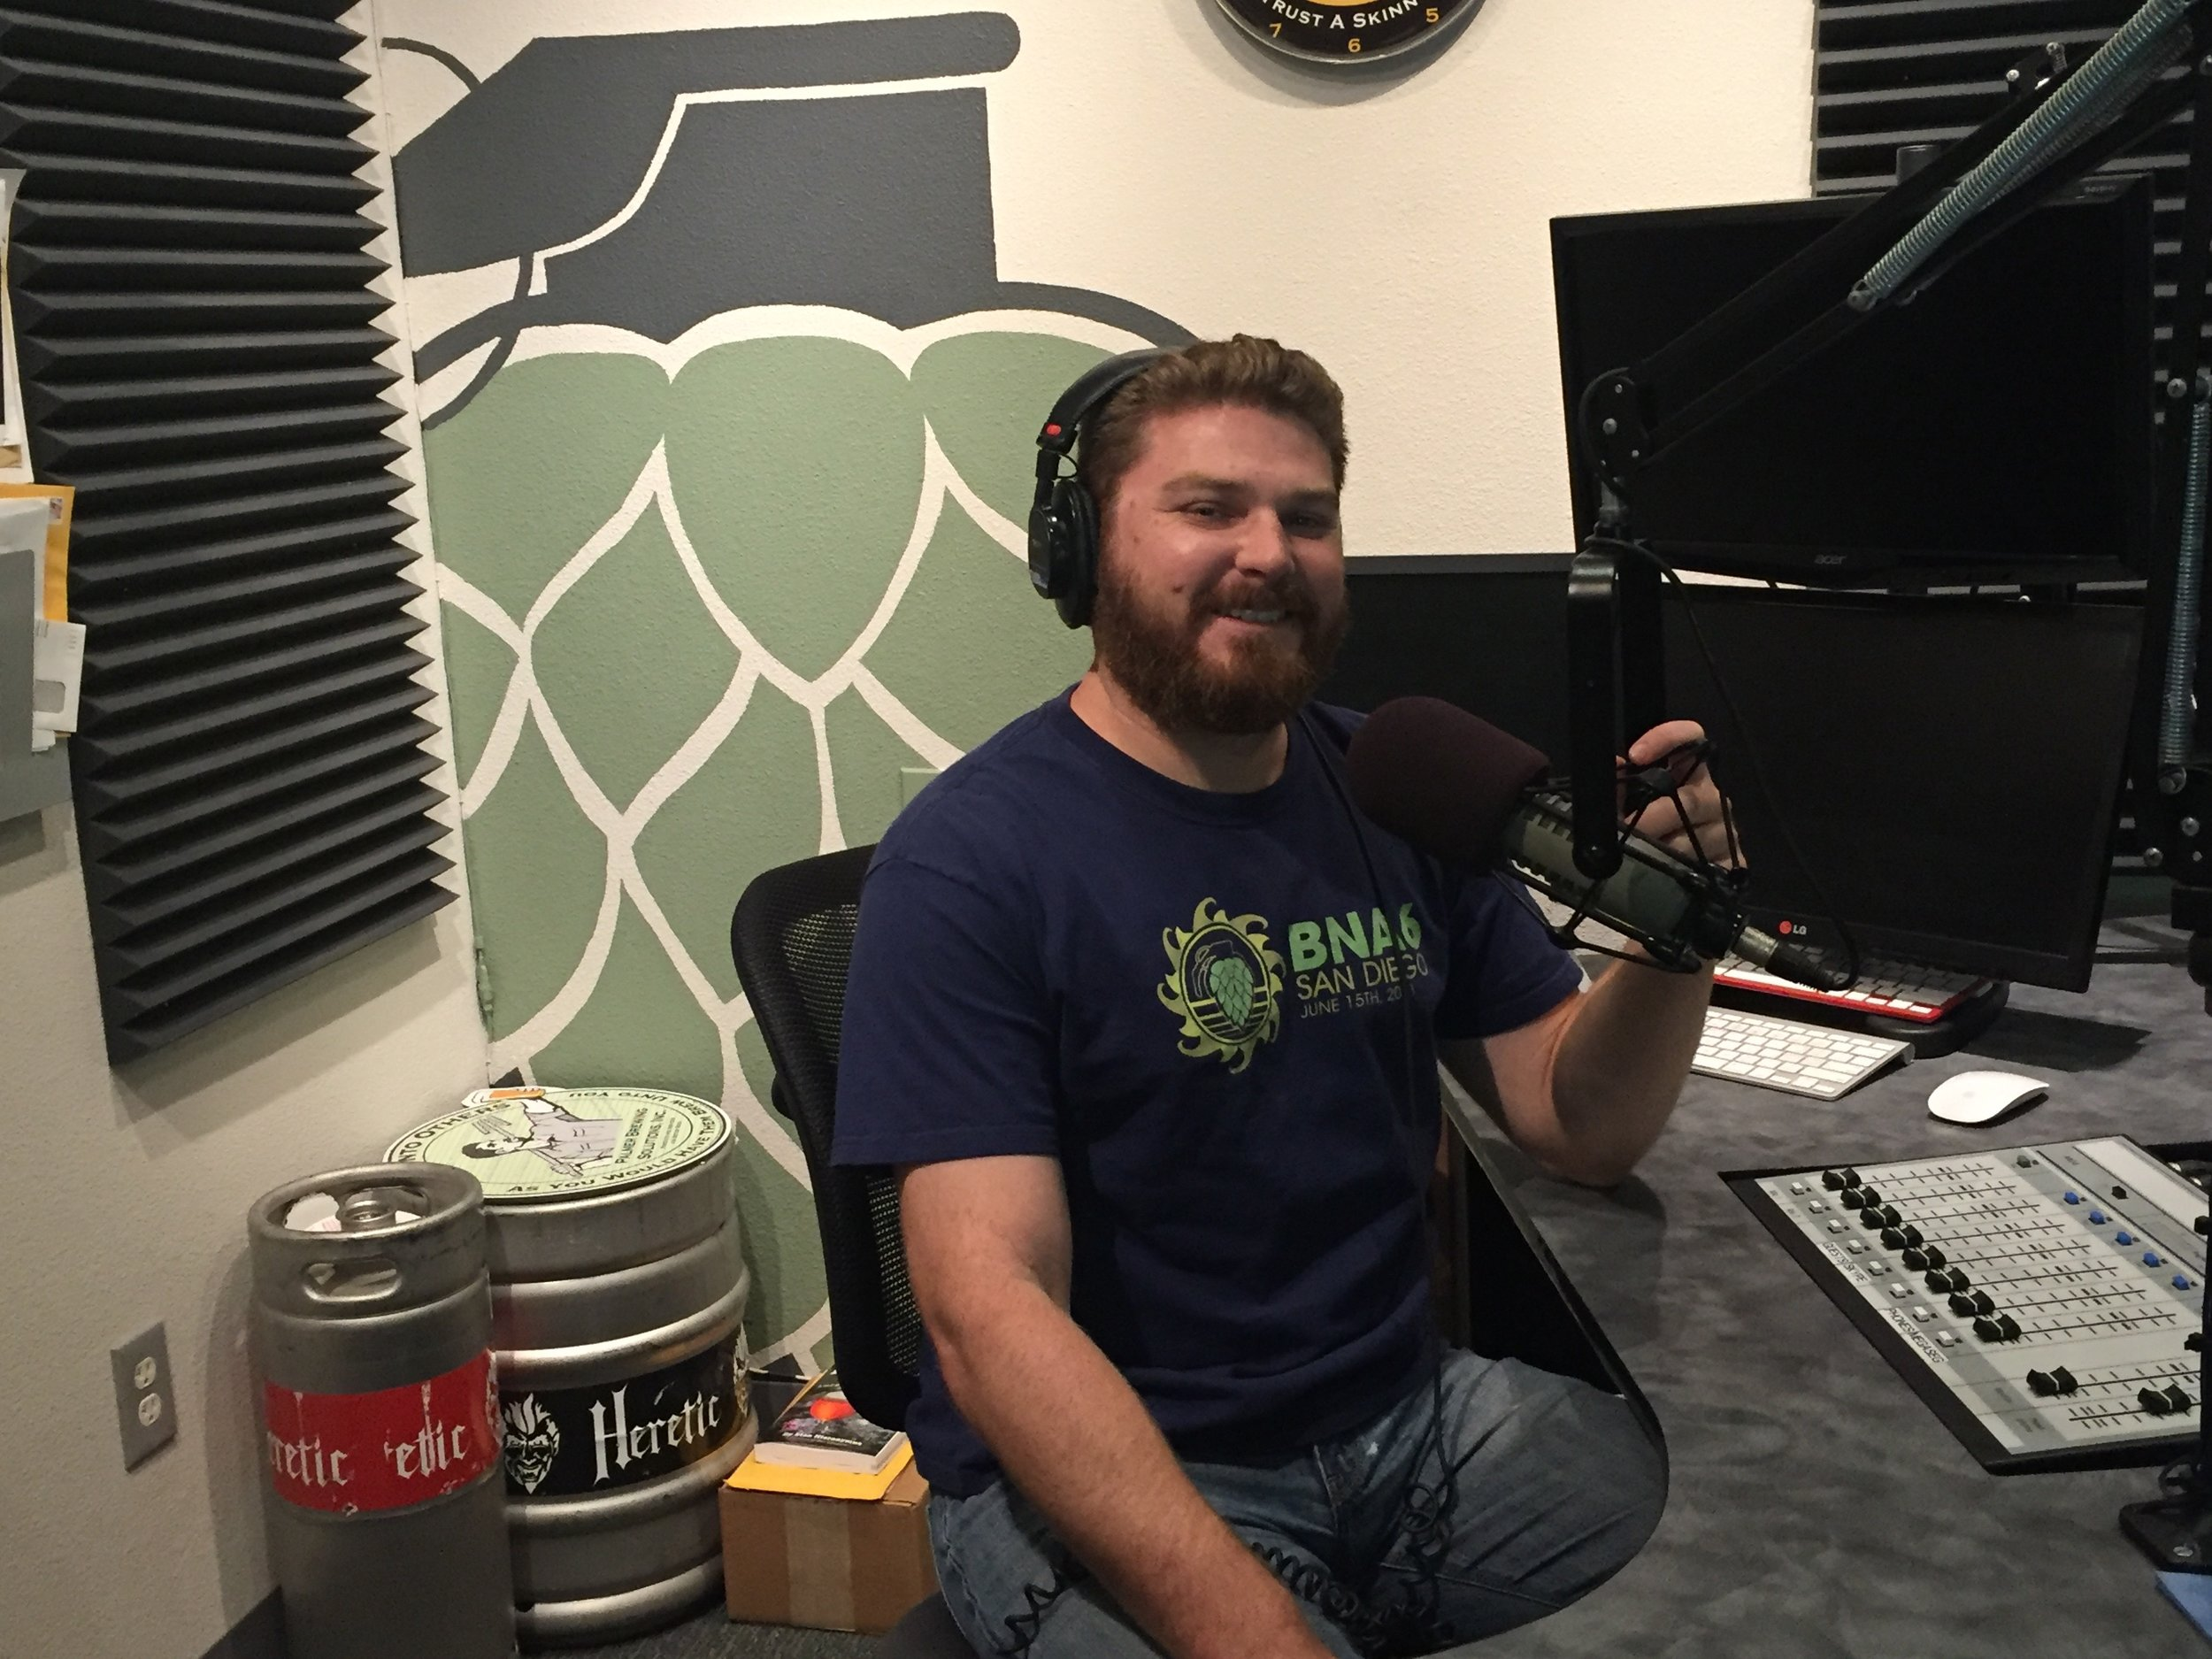 Scott at Tap room radio.jpg